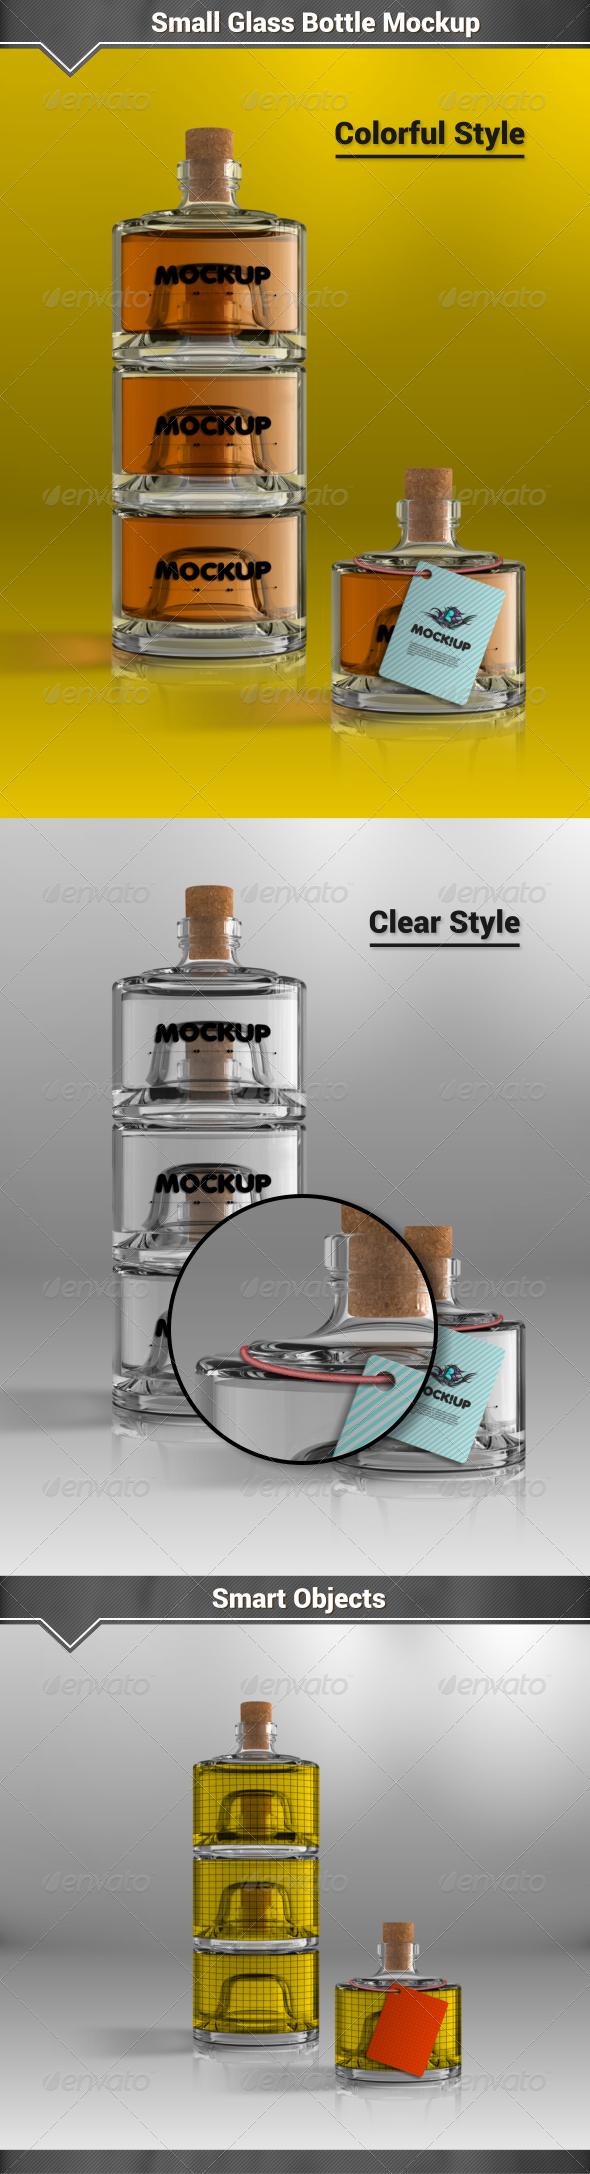 Small Glass Bottles Mockup